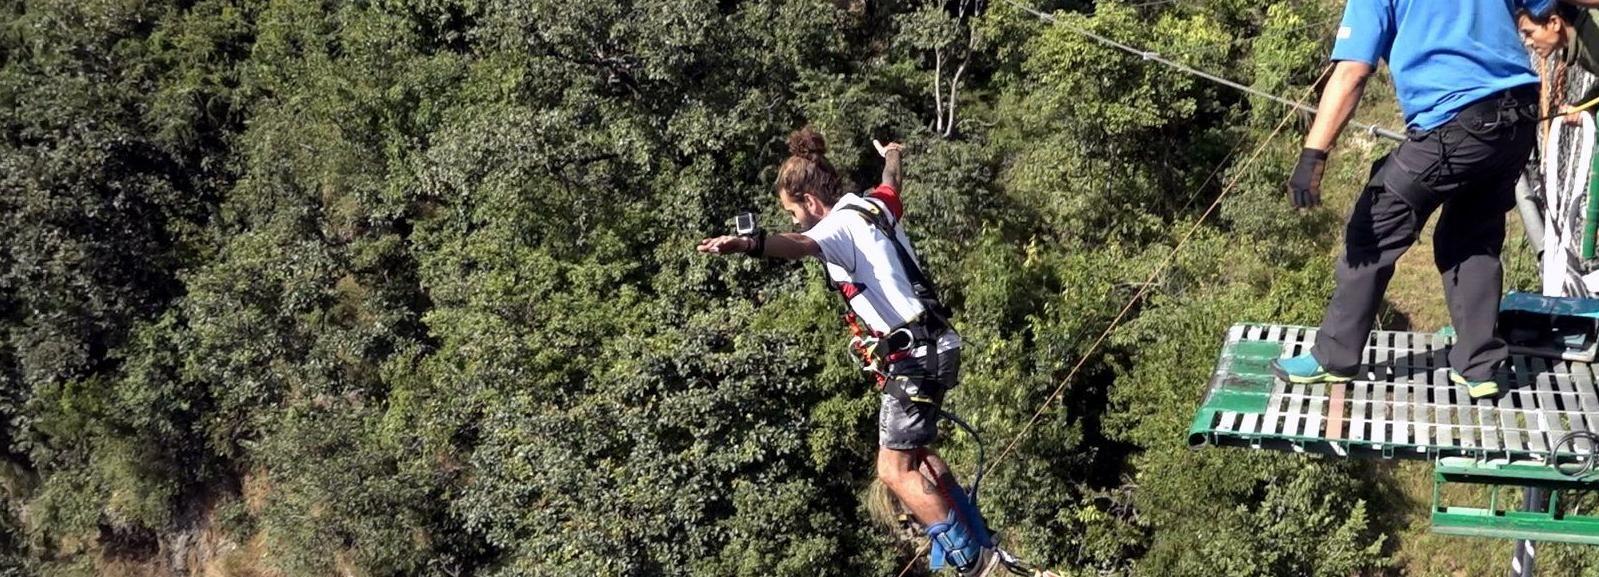 From Kathmandu: Bungee Jumping Day Trip